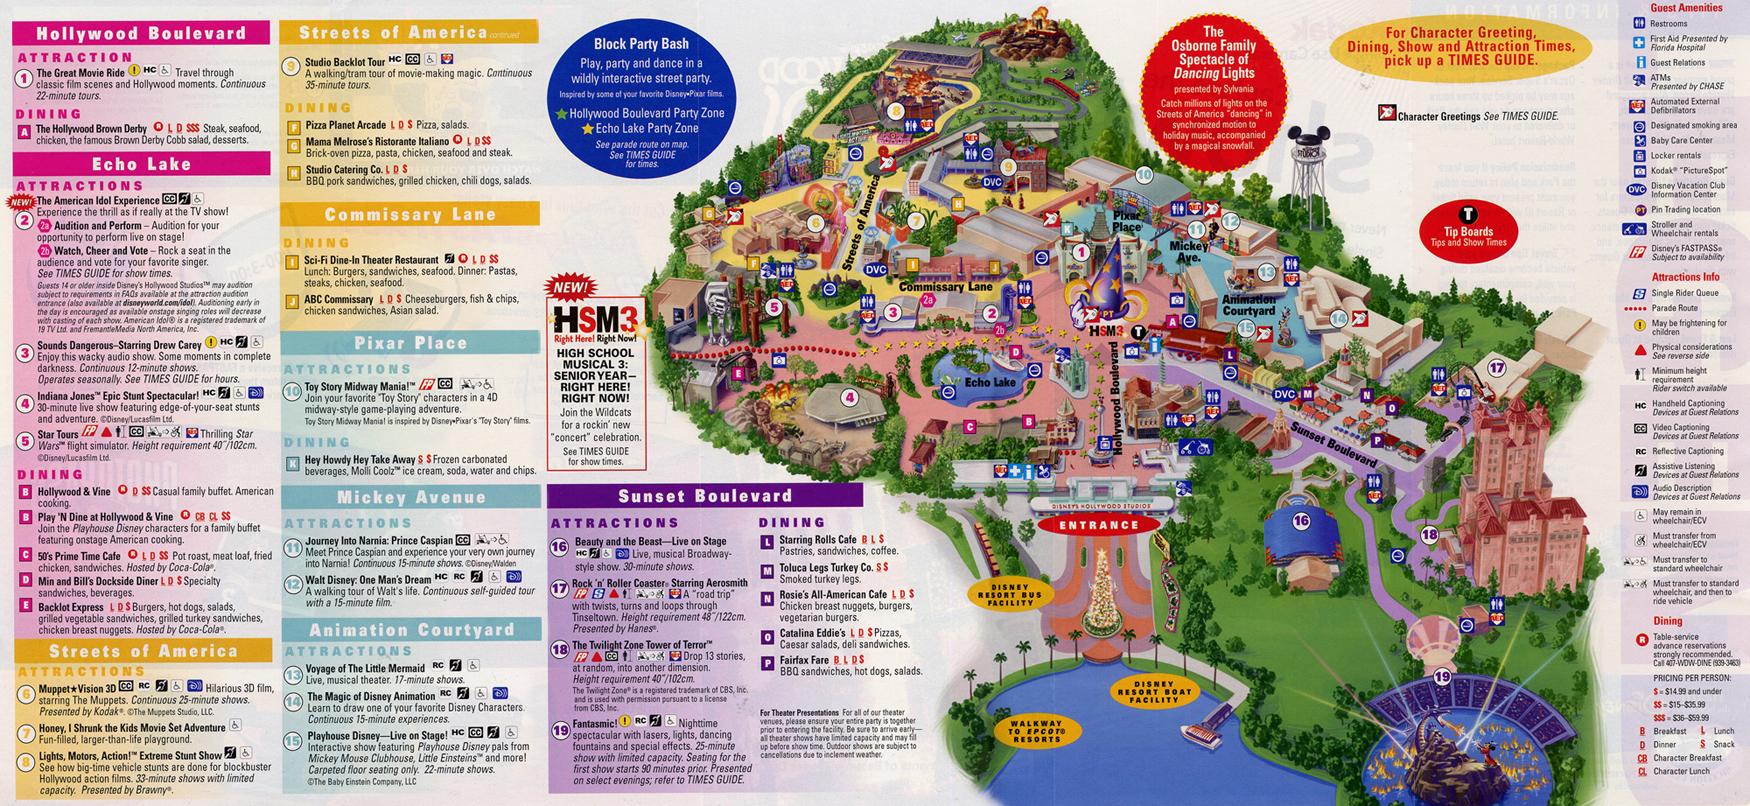 Disney's Hollywood Studios park map - Disney Secrets